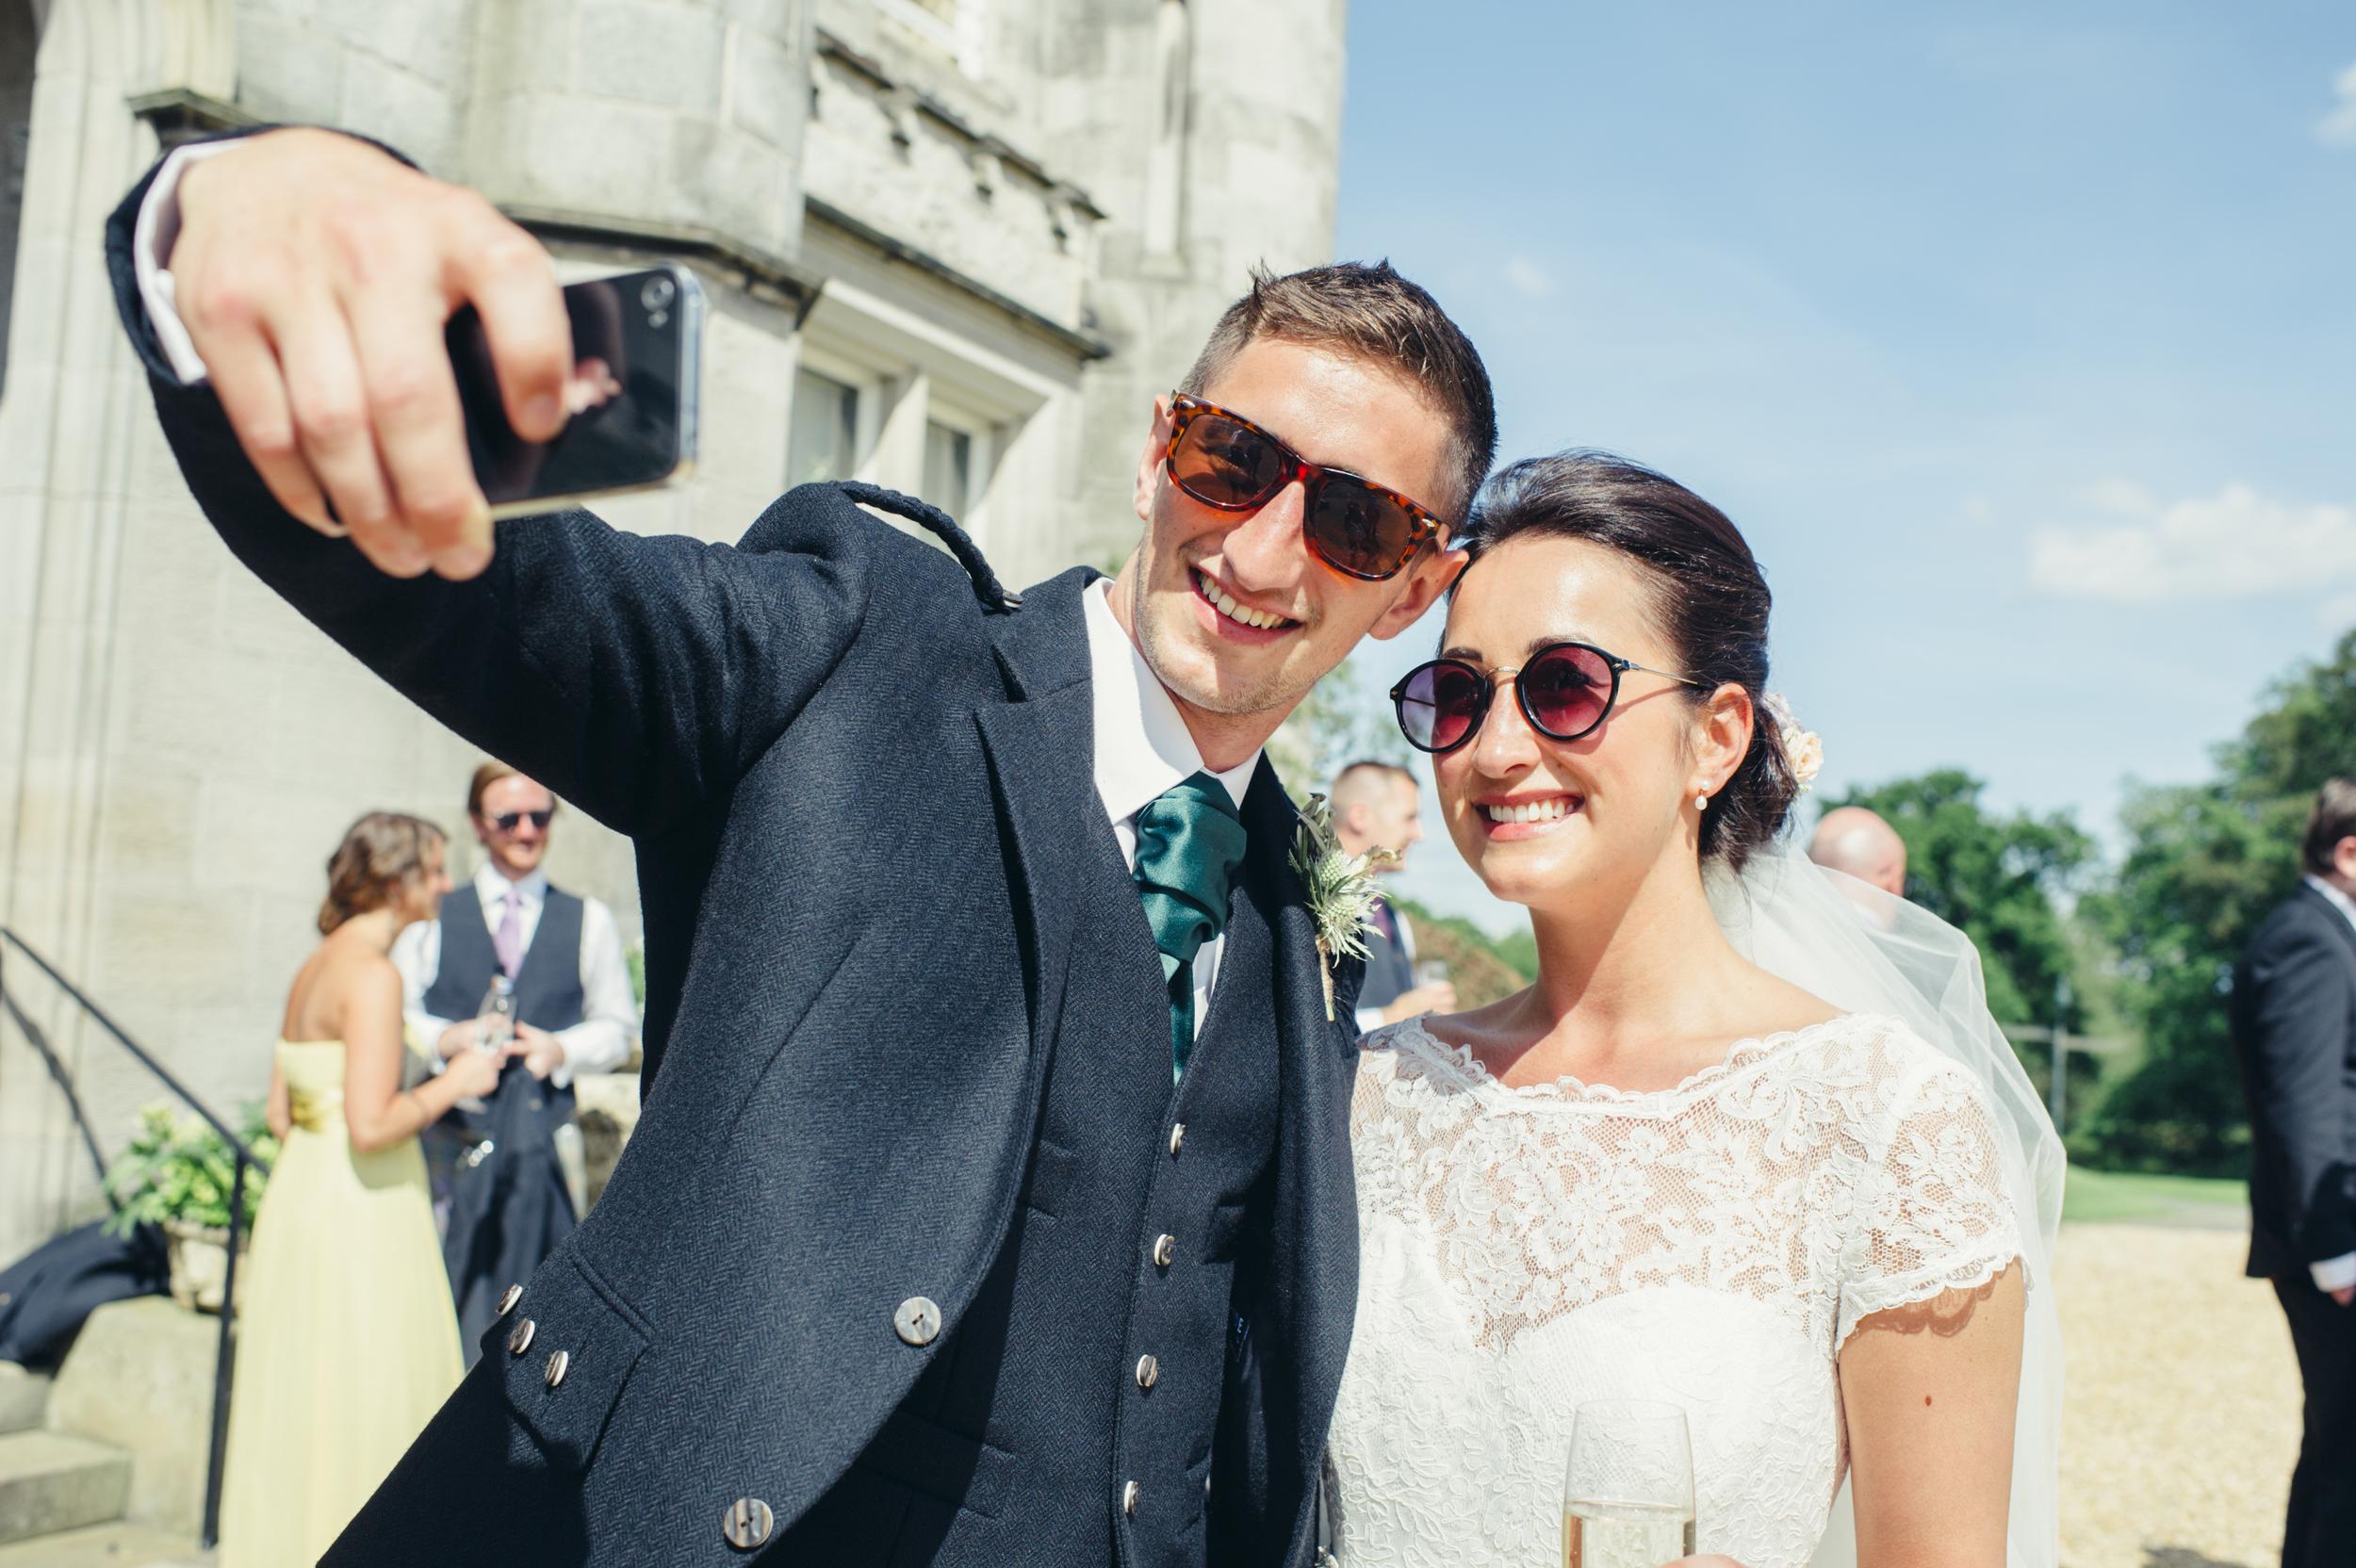 0126-lisa-devine-alternative-creative-wedding-photography-glasgow-edinburgh.JPG